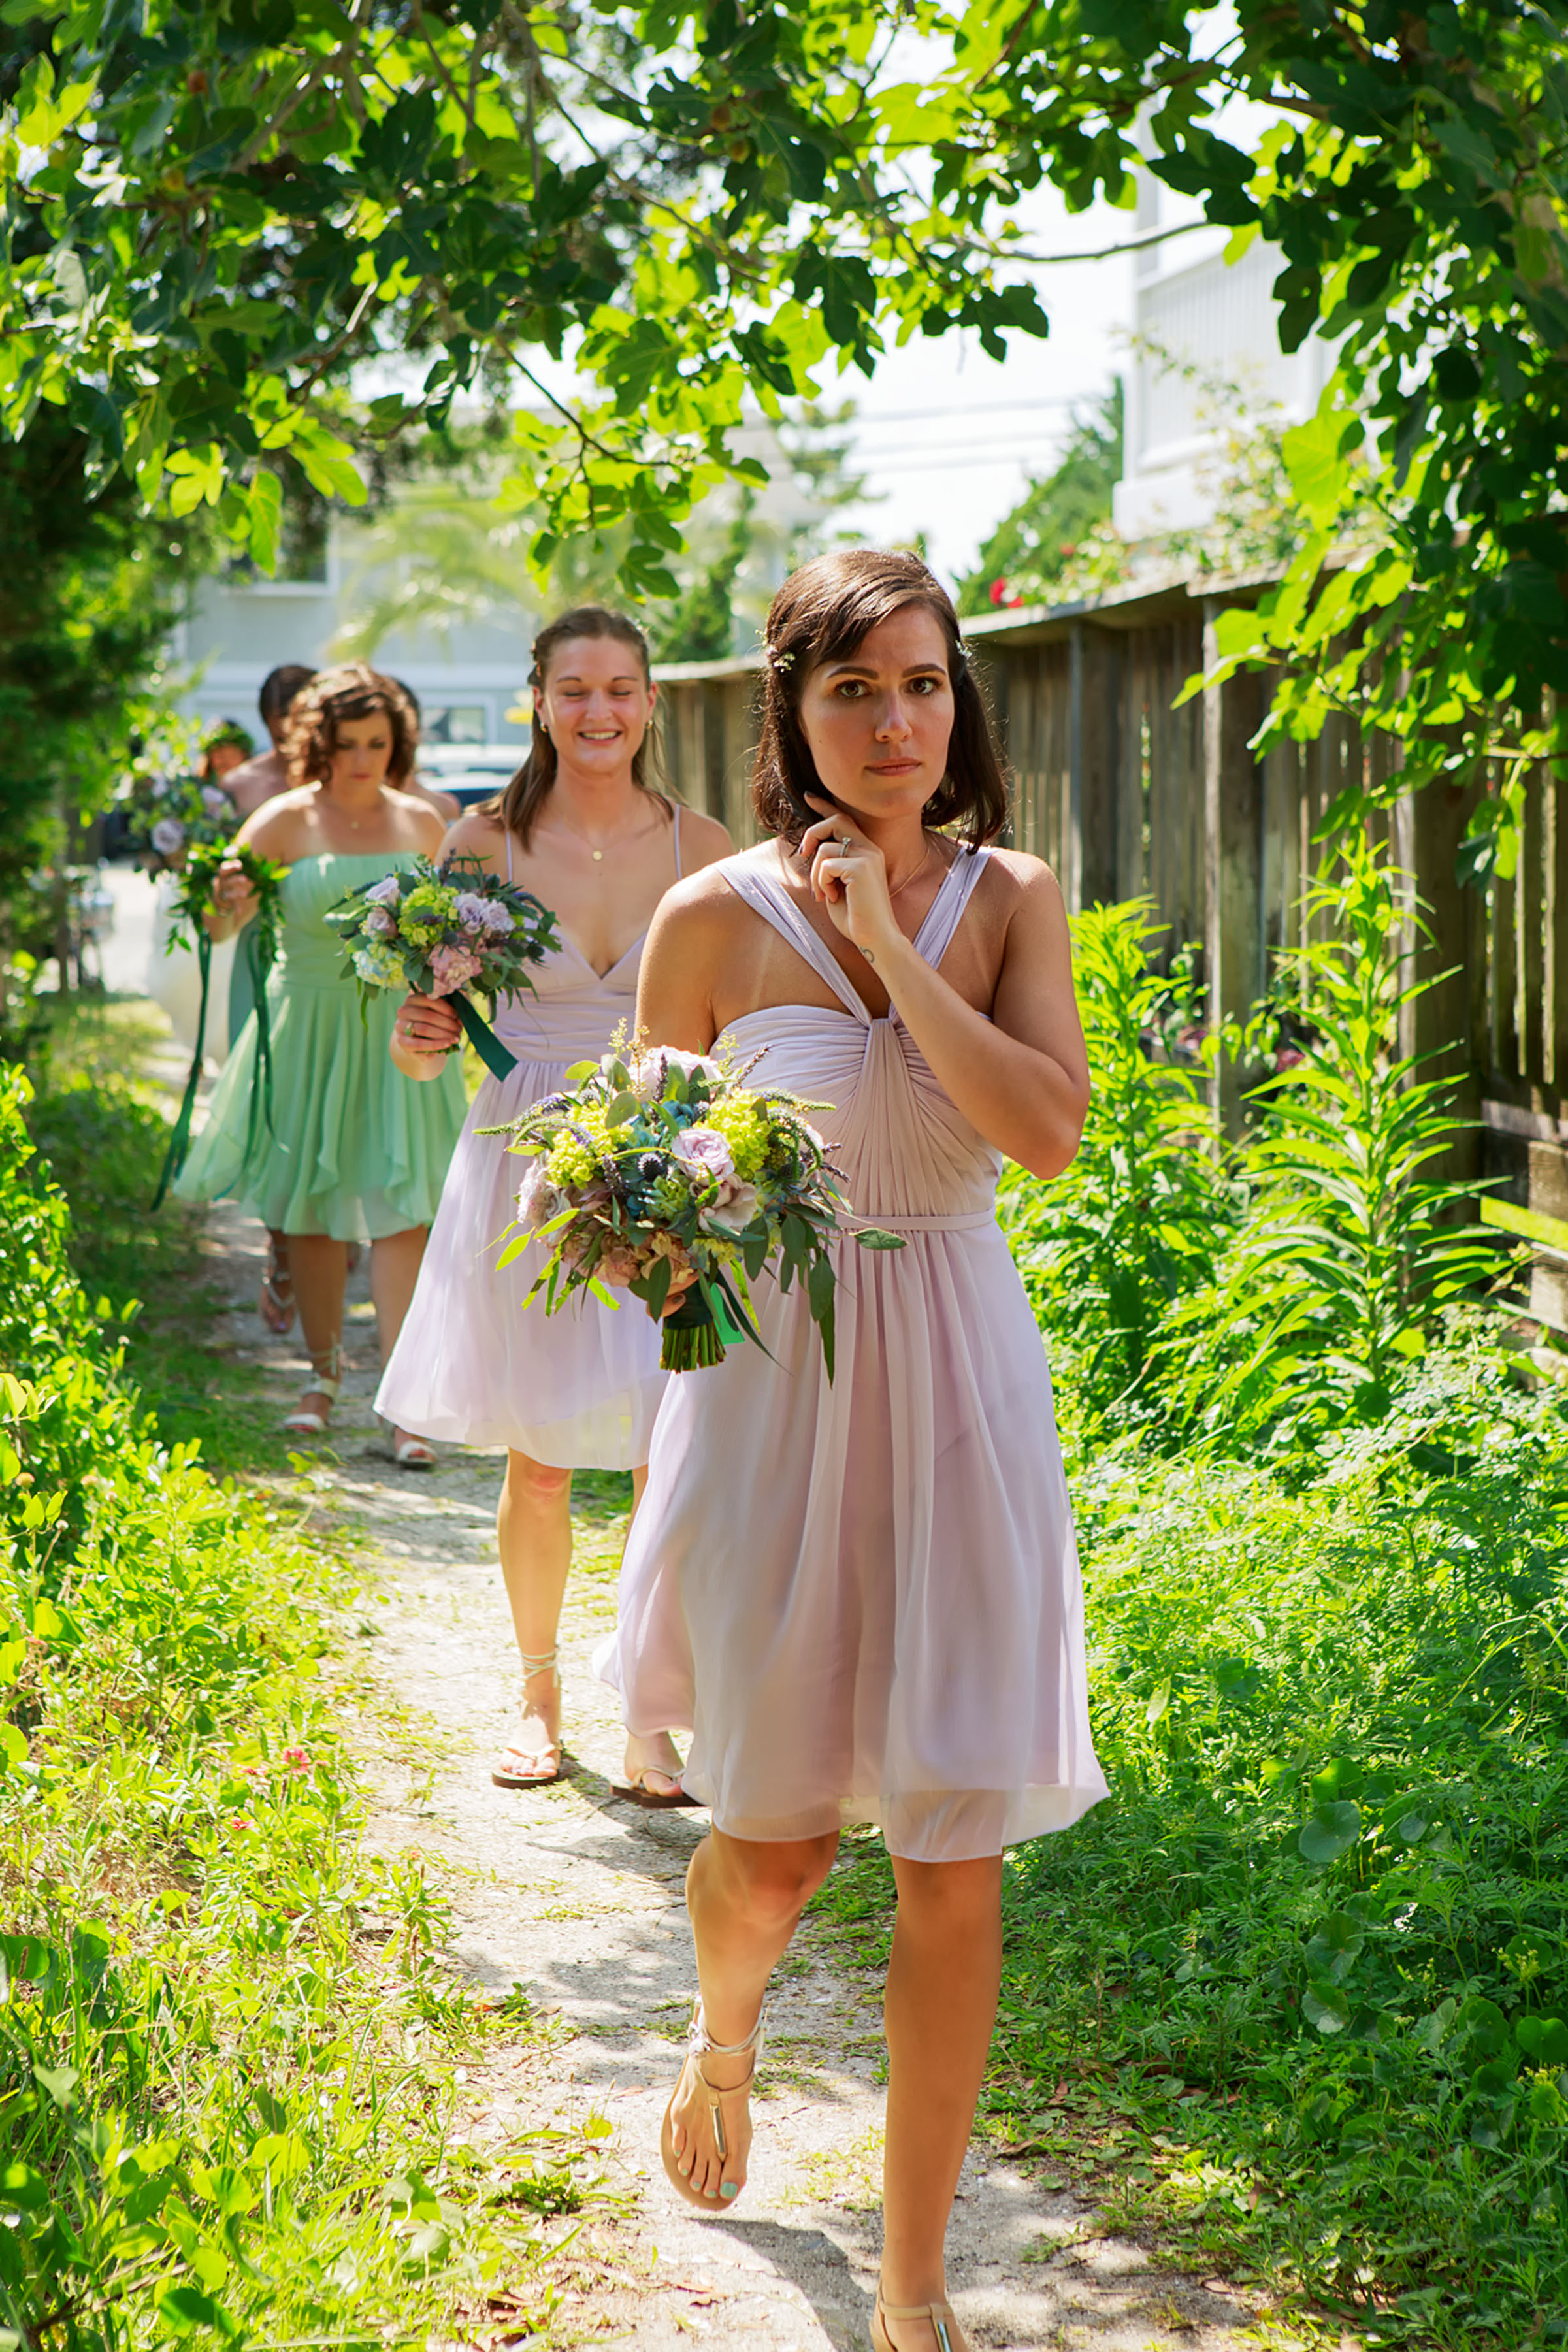 North_Carolina_Wedding_Photographer_Tiffany_Abruzzo_Ceremony_1.jpg